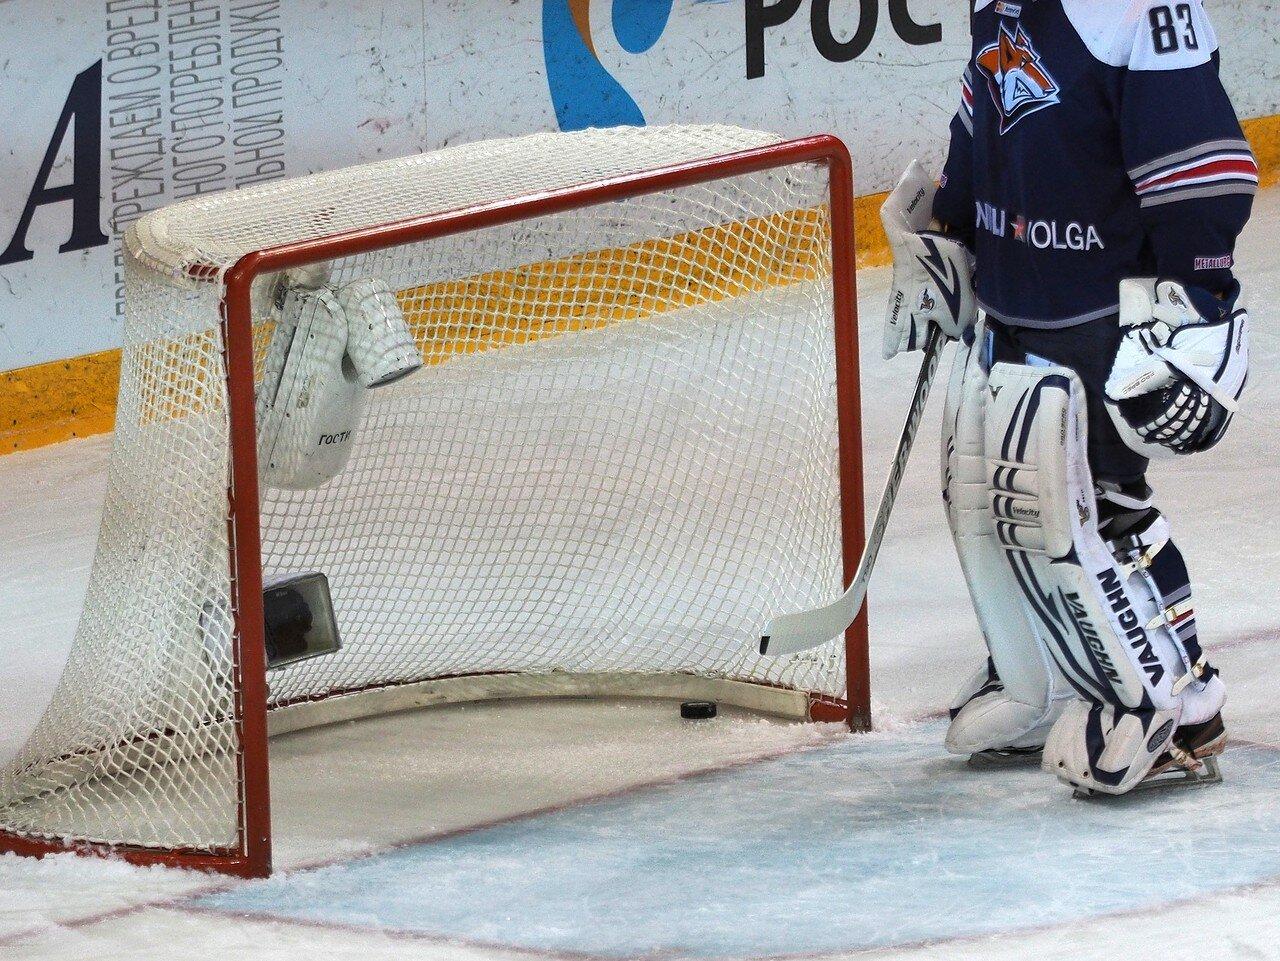 94Плей-офф 2016 Восток Финал Металлург - Салават Юлаев 23.03.2016